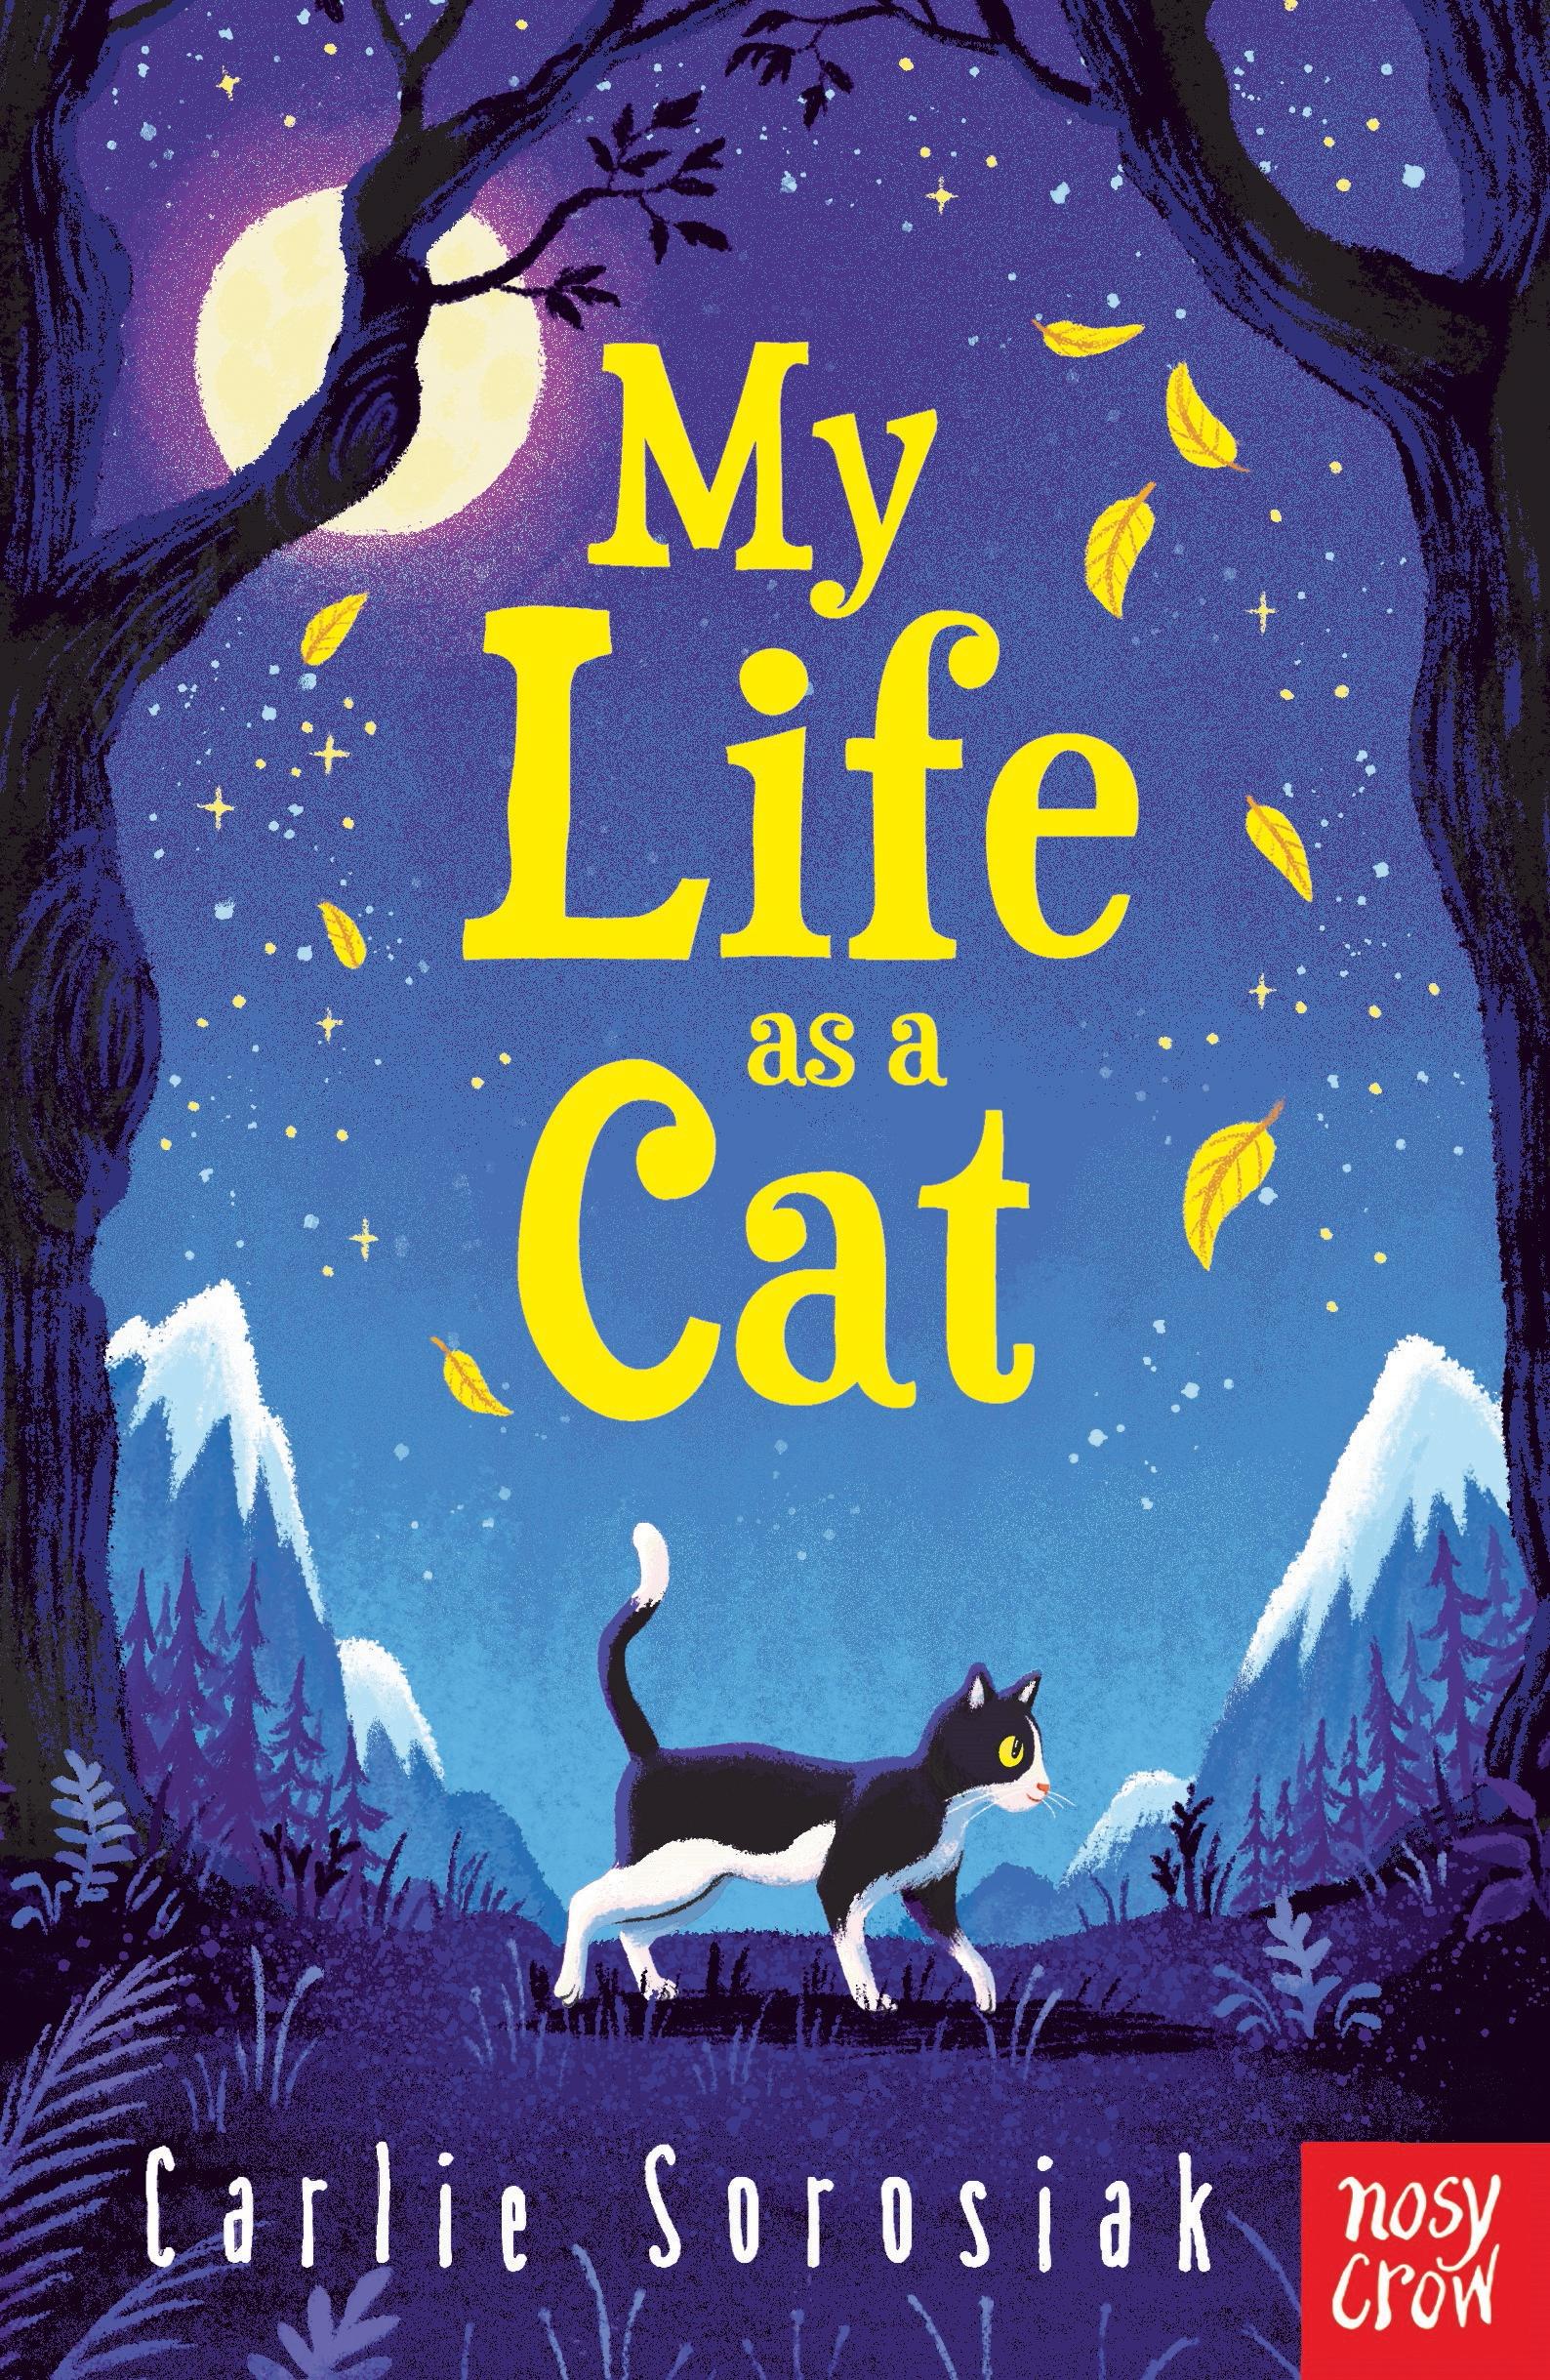 [PDF] [EPUB] My Life as a Cat Download by Carlie Sorosiak